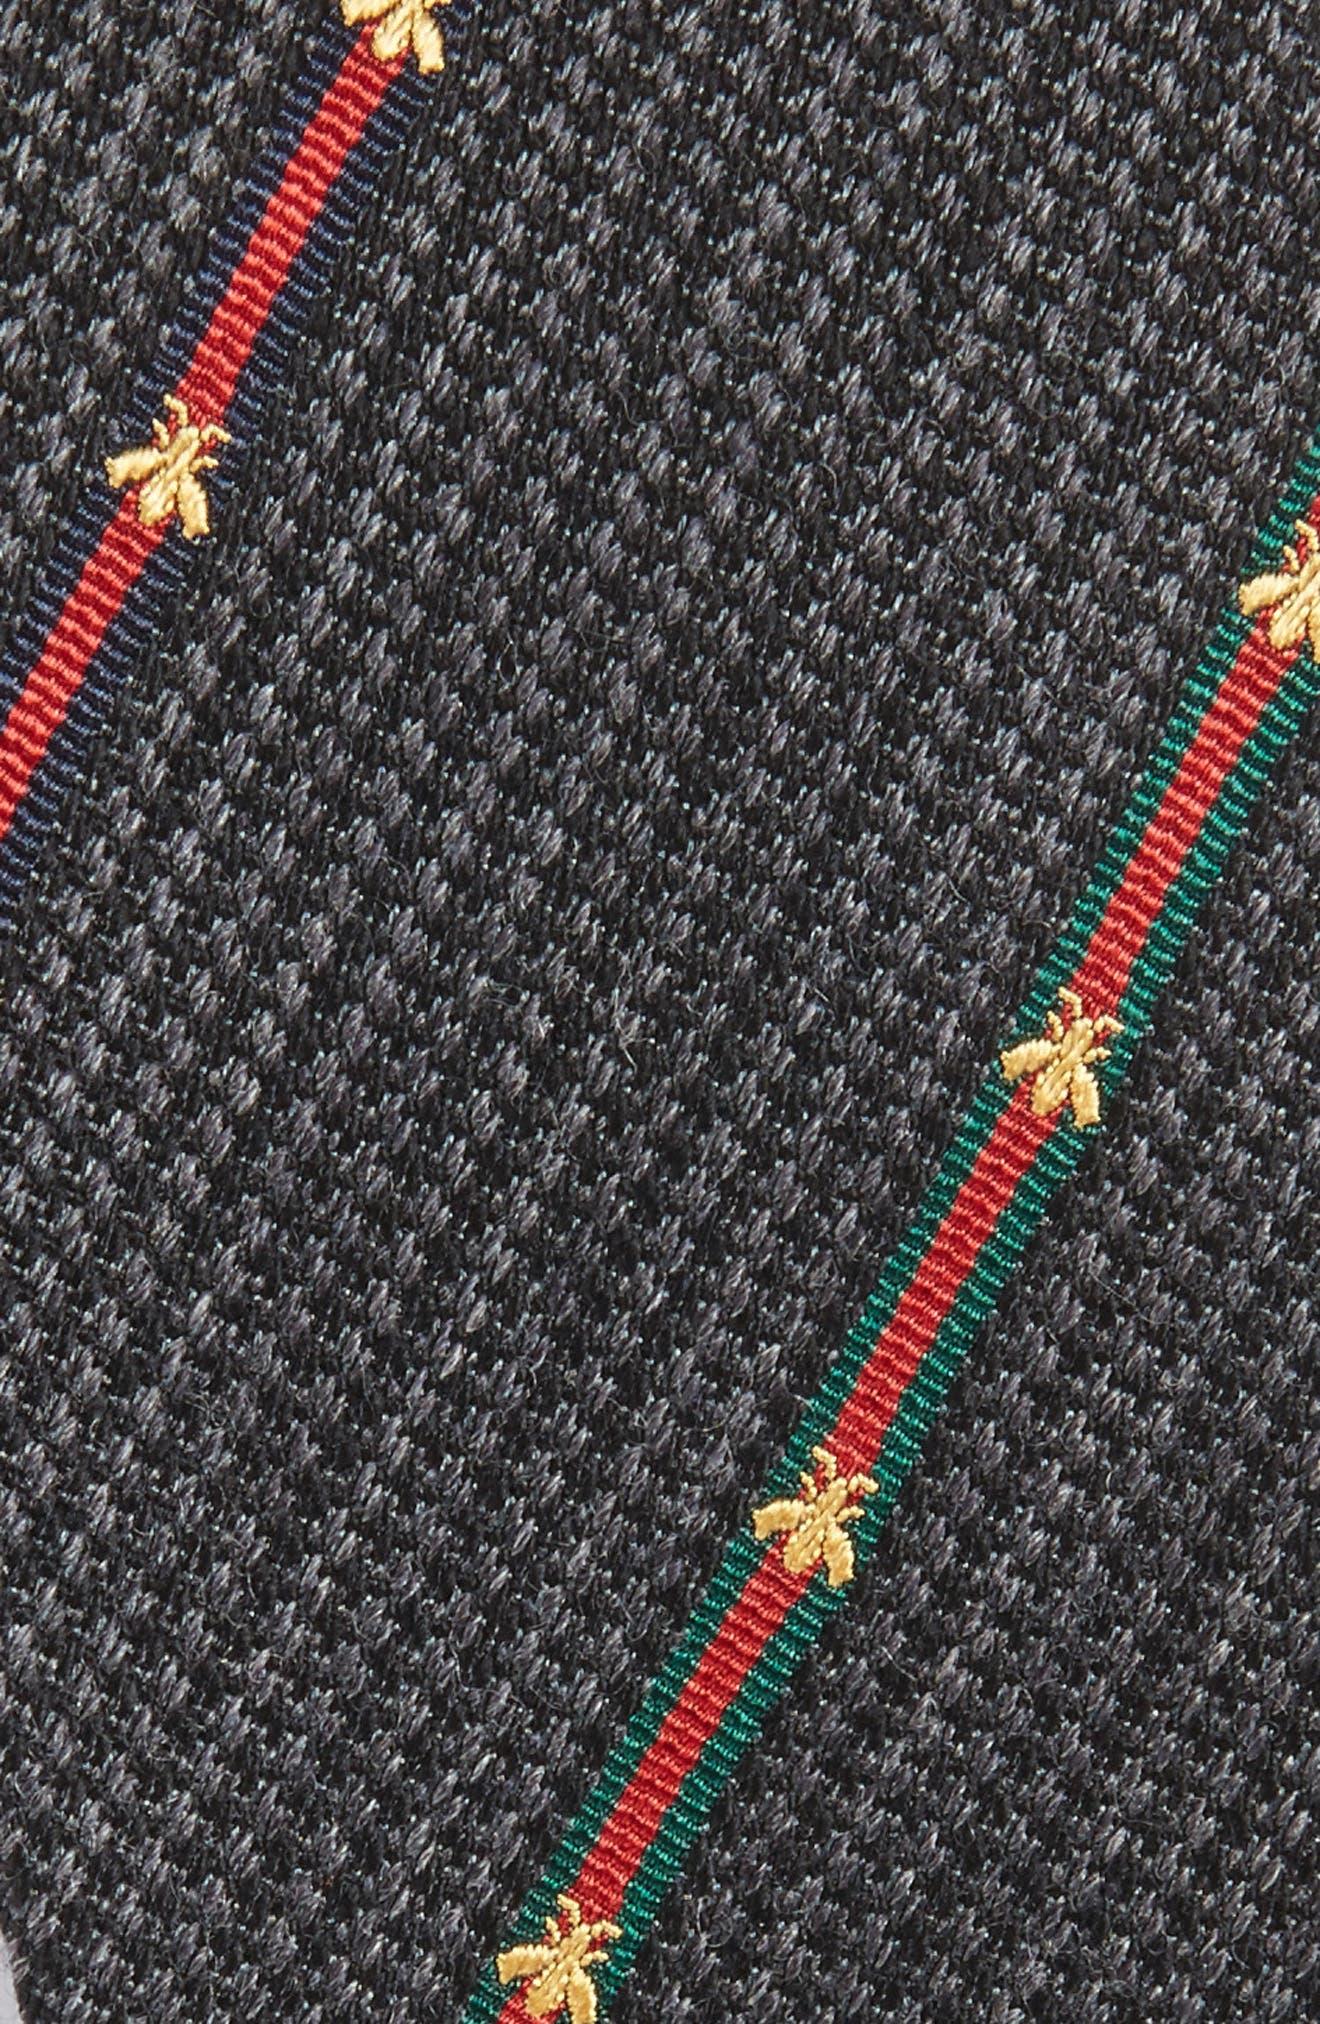 Savanur Silk & Wool Tie,                             Alternate thumbnail 2, color,                             003